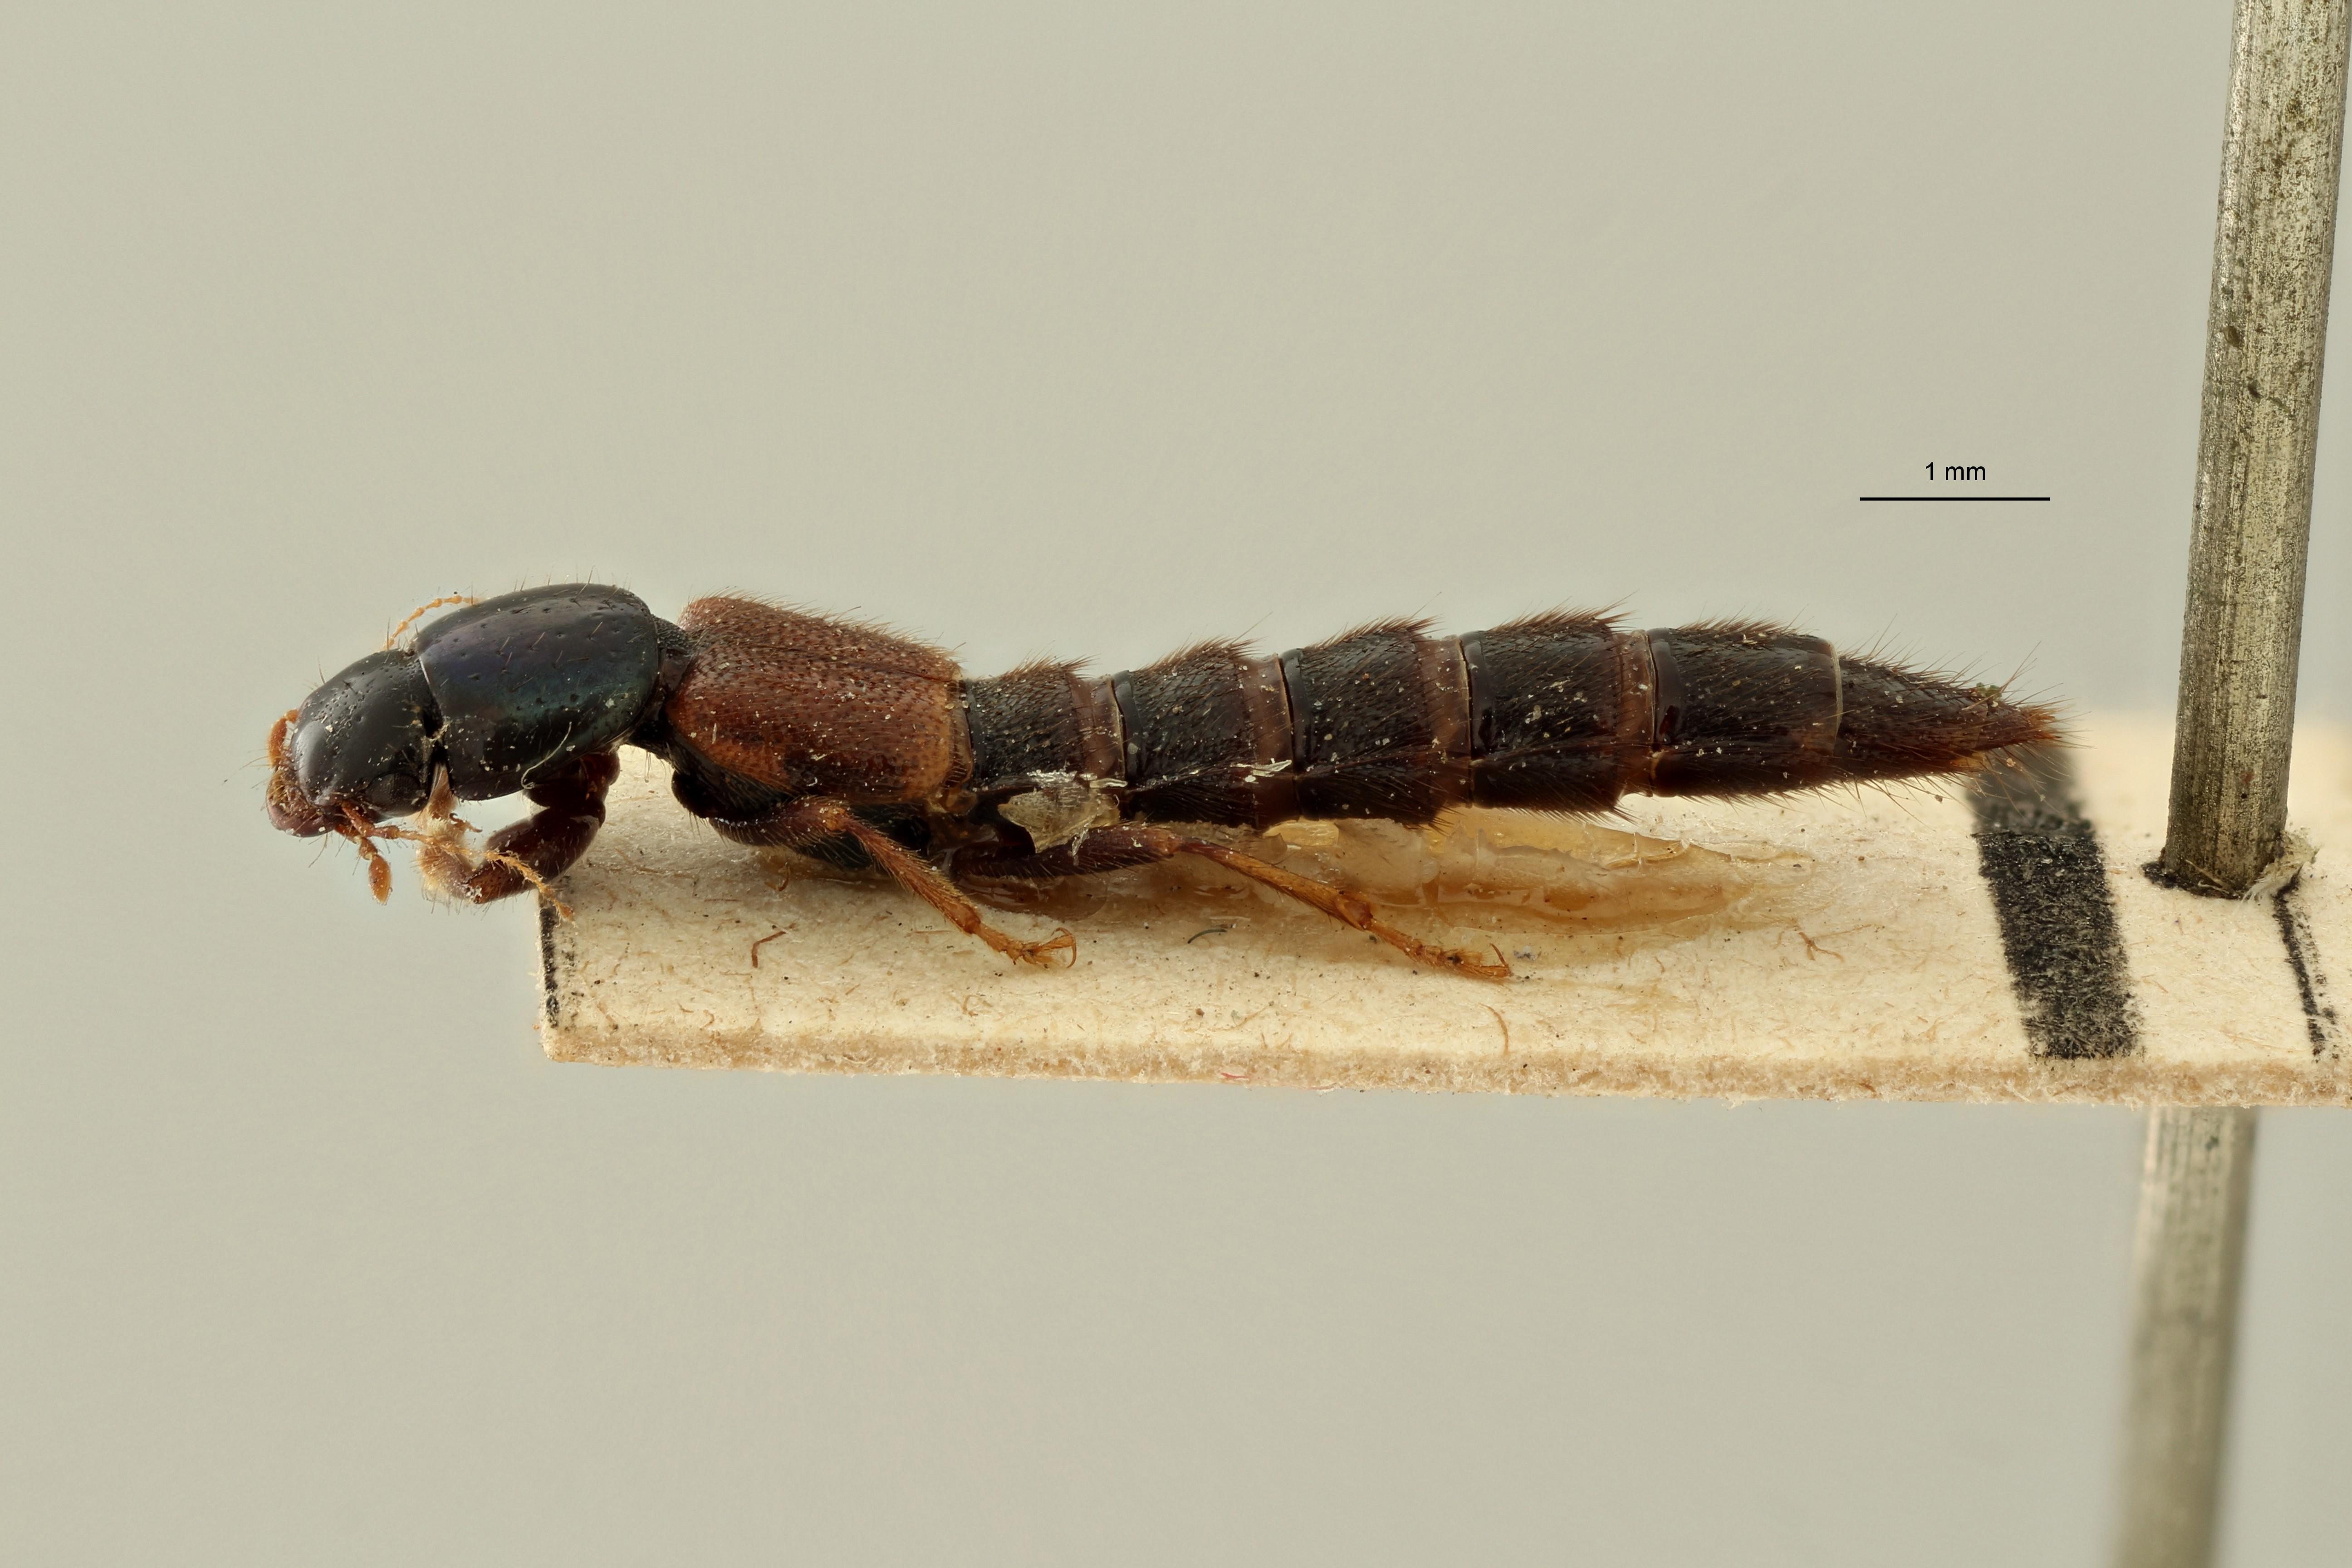 Pinophilus beccarii et L ZS PMax Scaled.jpeg